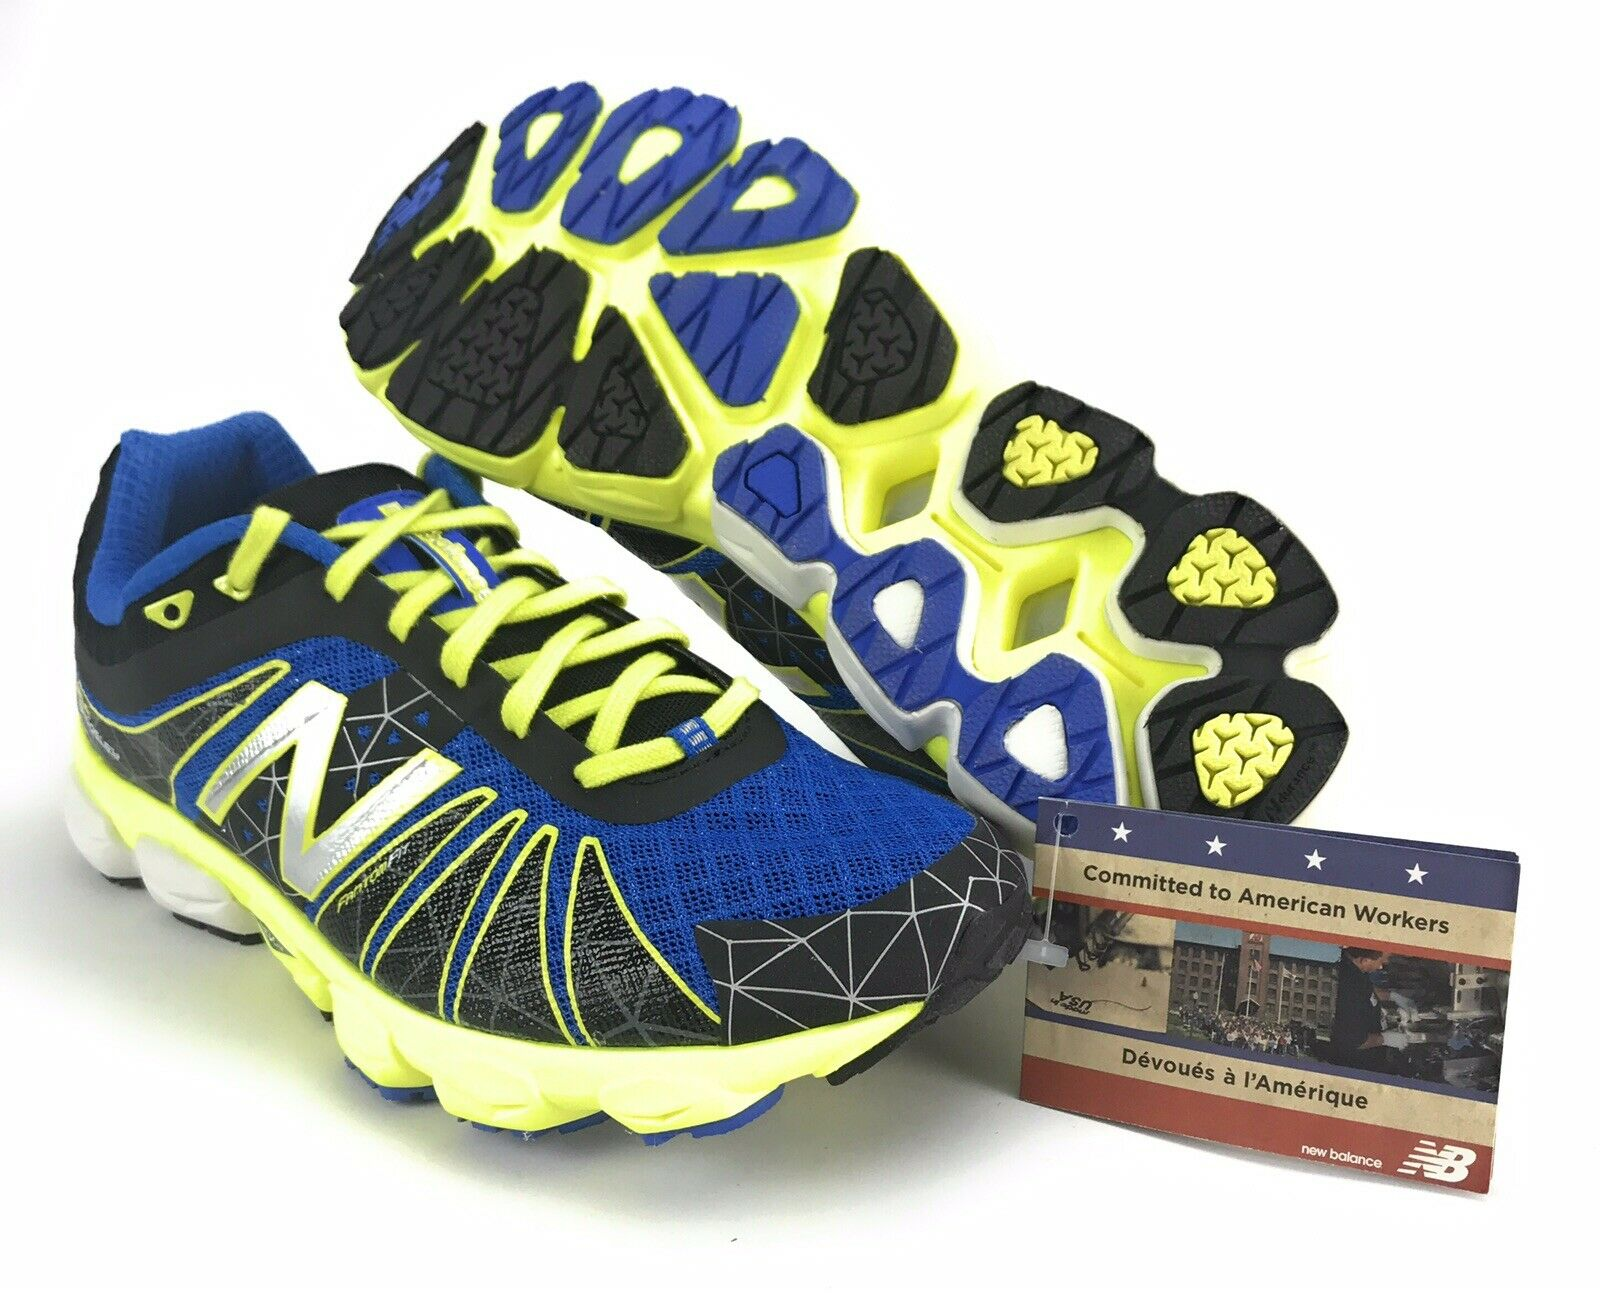 New Balance Men's 890v4 Baddeley Black Hi Vis Yellow bluee Running shoes Sz 9 D